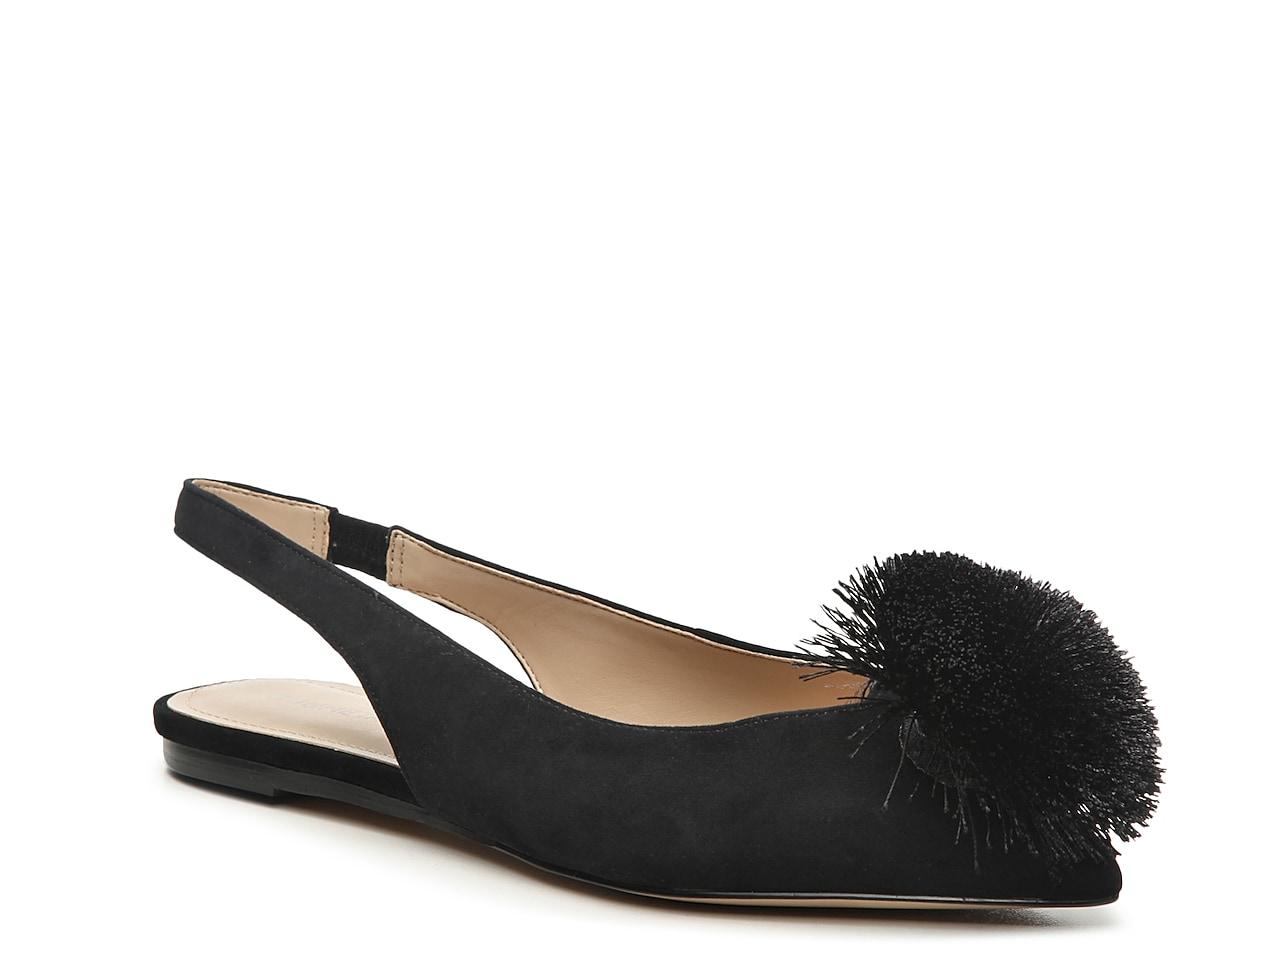 Details about  /Pleasant Pumps Memory Foam The Samantha Sandals Flats Black Leather Comfortable!